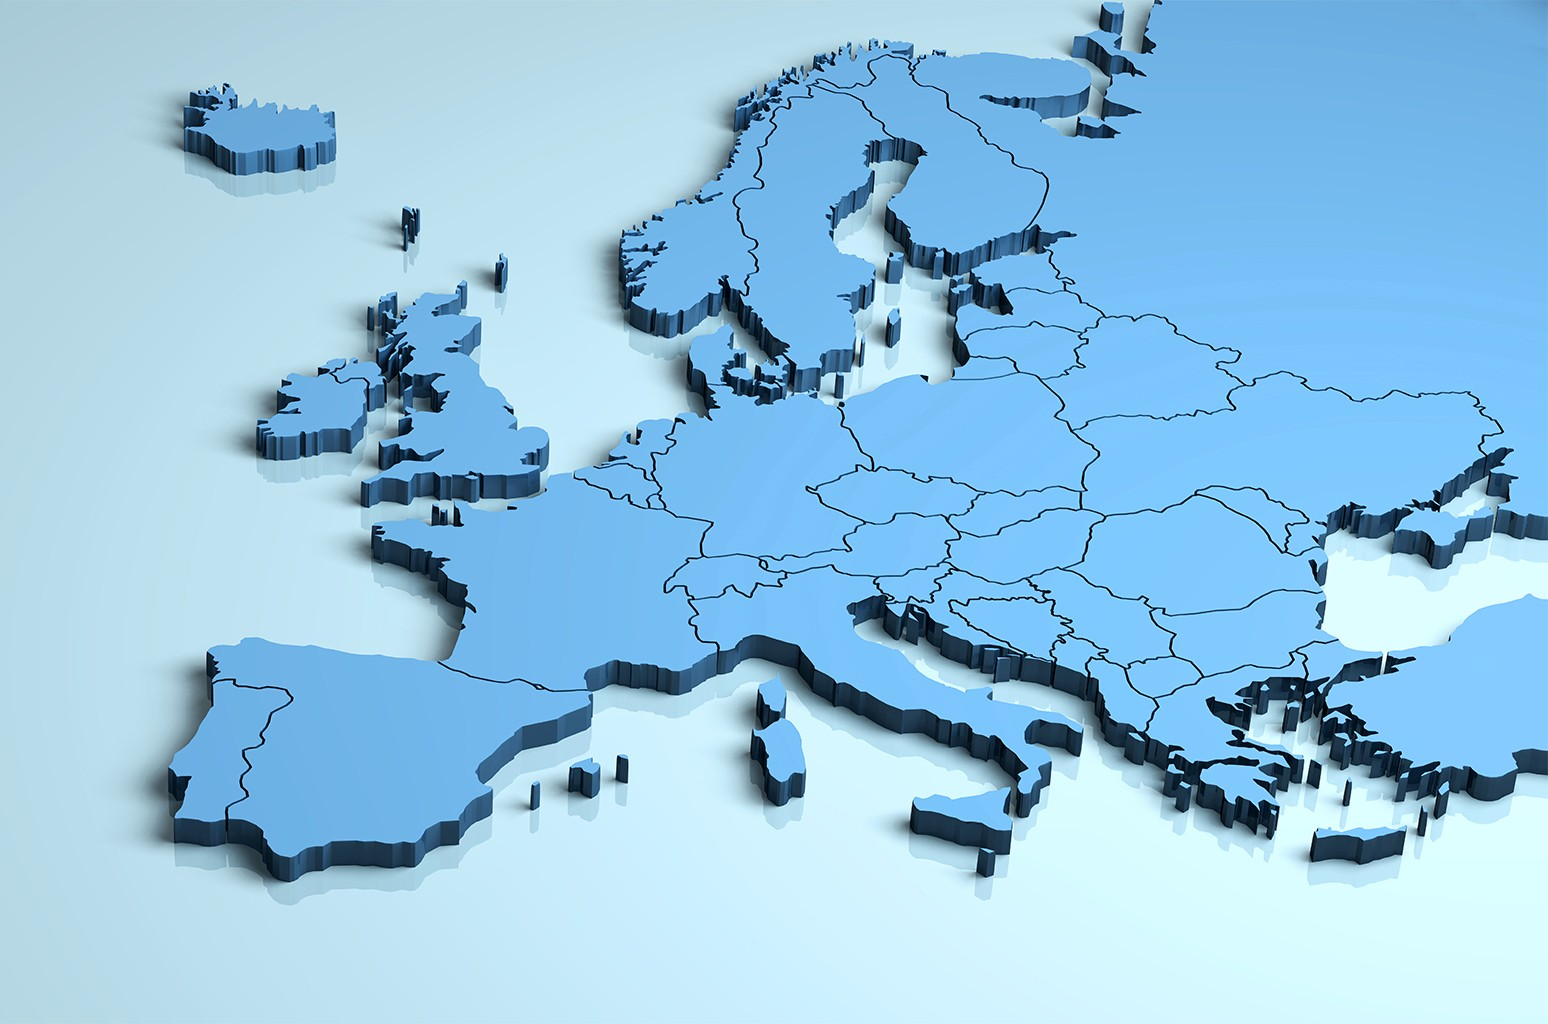 COVID-19 снижает доходы Европы от музыки на 76%